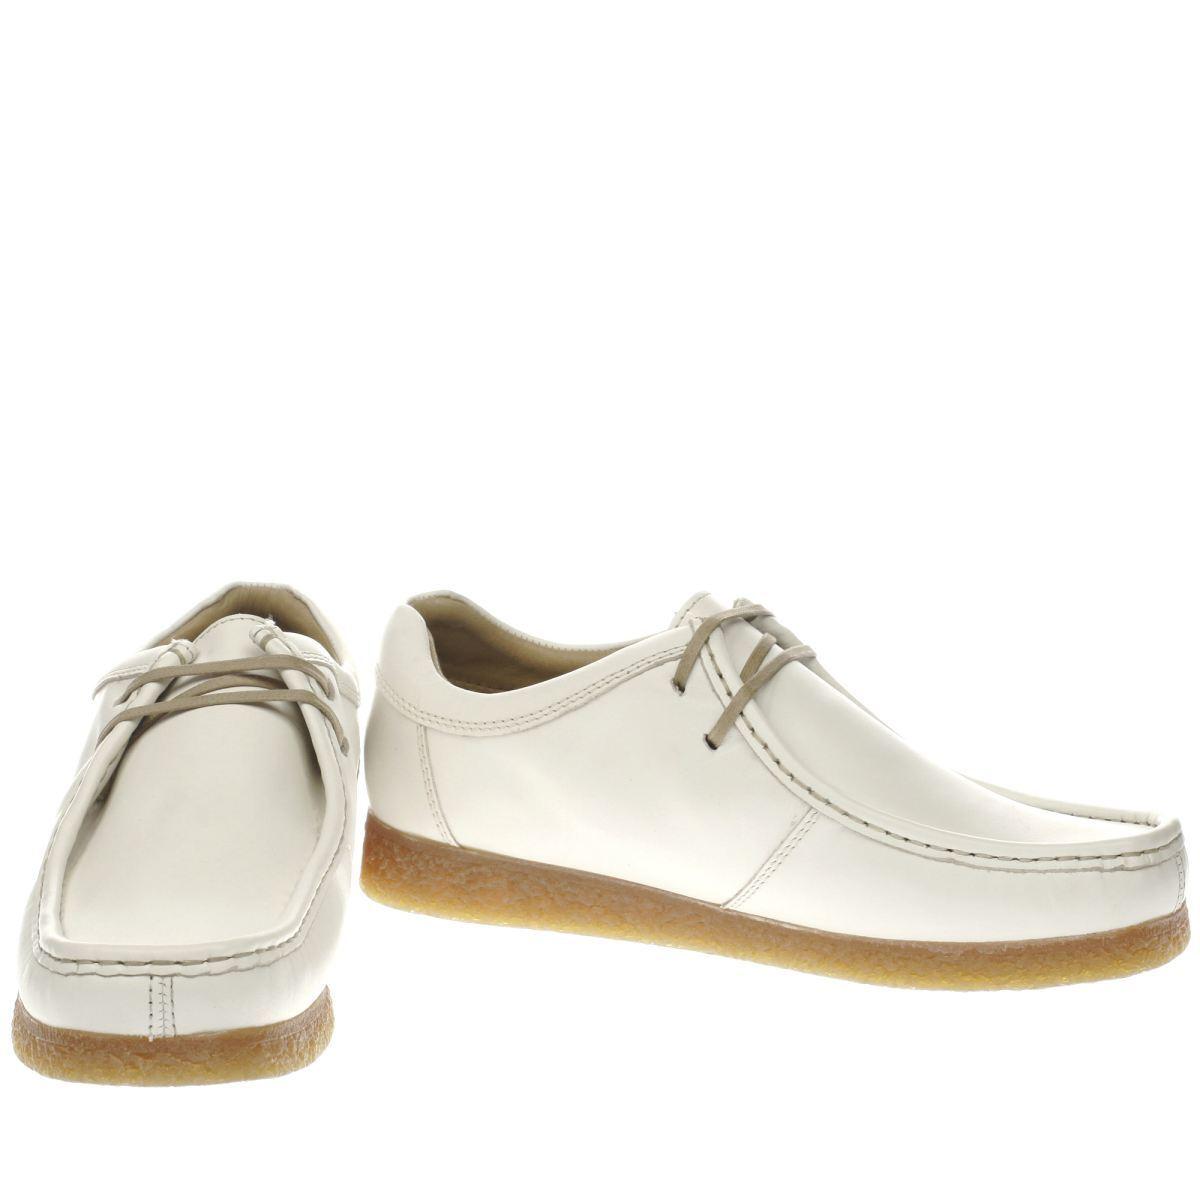 BASE LONDON 12 Weiß GENESIS Schuhe SIZE 12 LONDON d98c9a